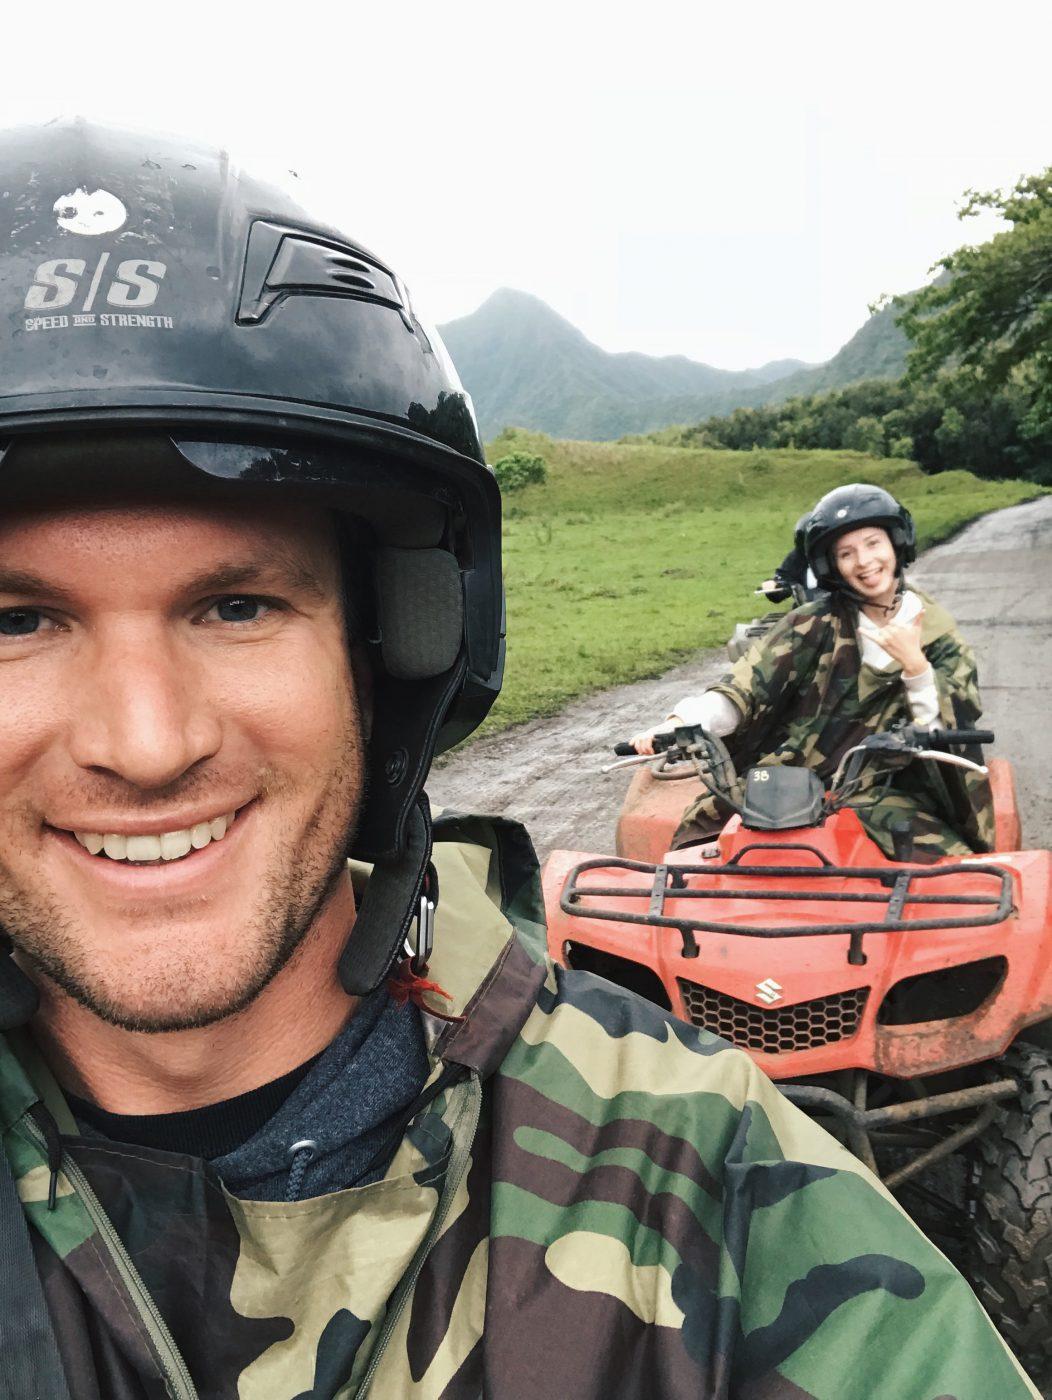 Oahu Atv Ride